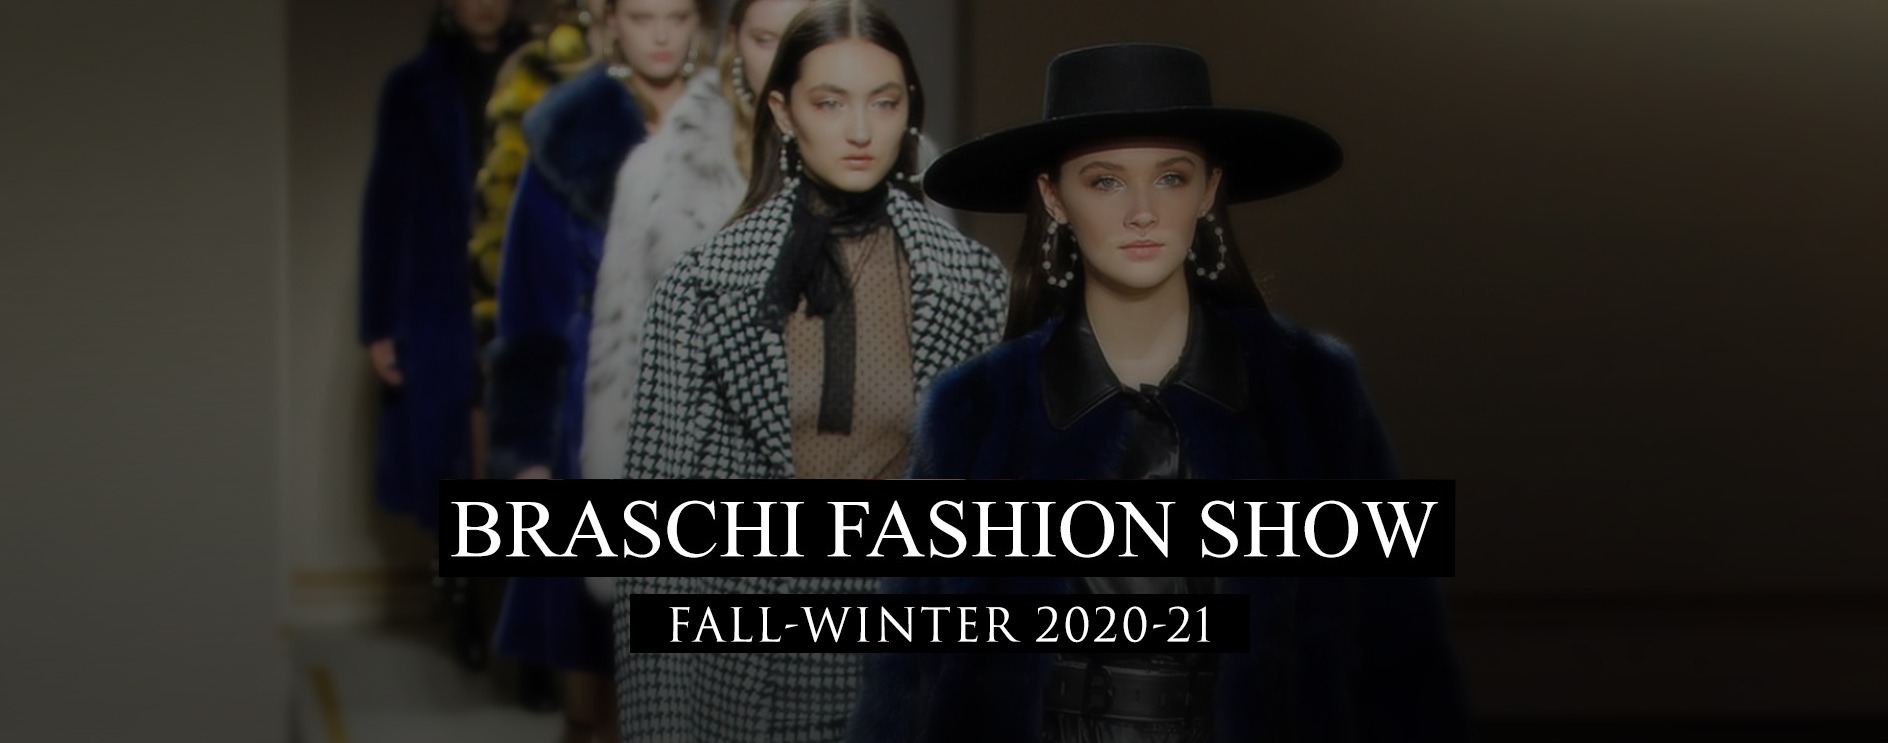 BRASCHI Furs in Dubai - Video